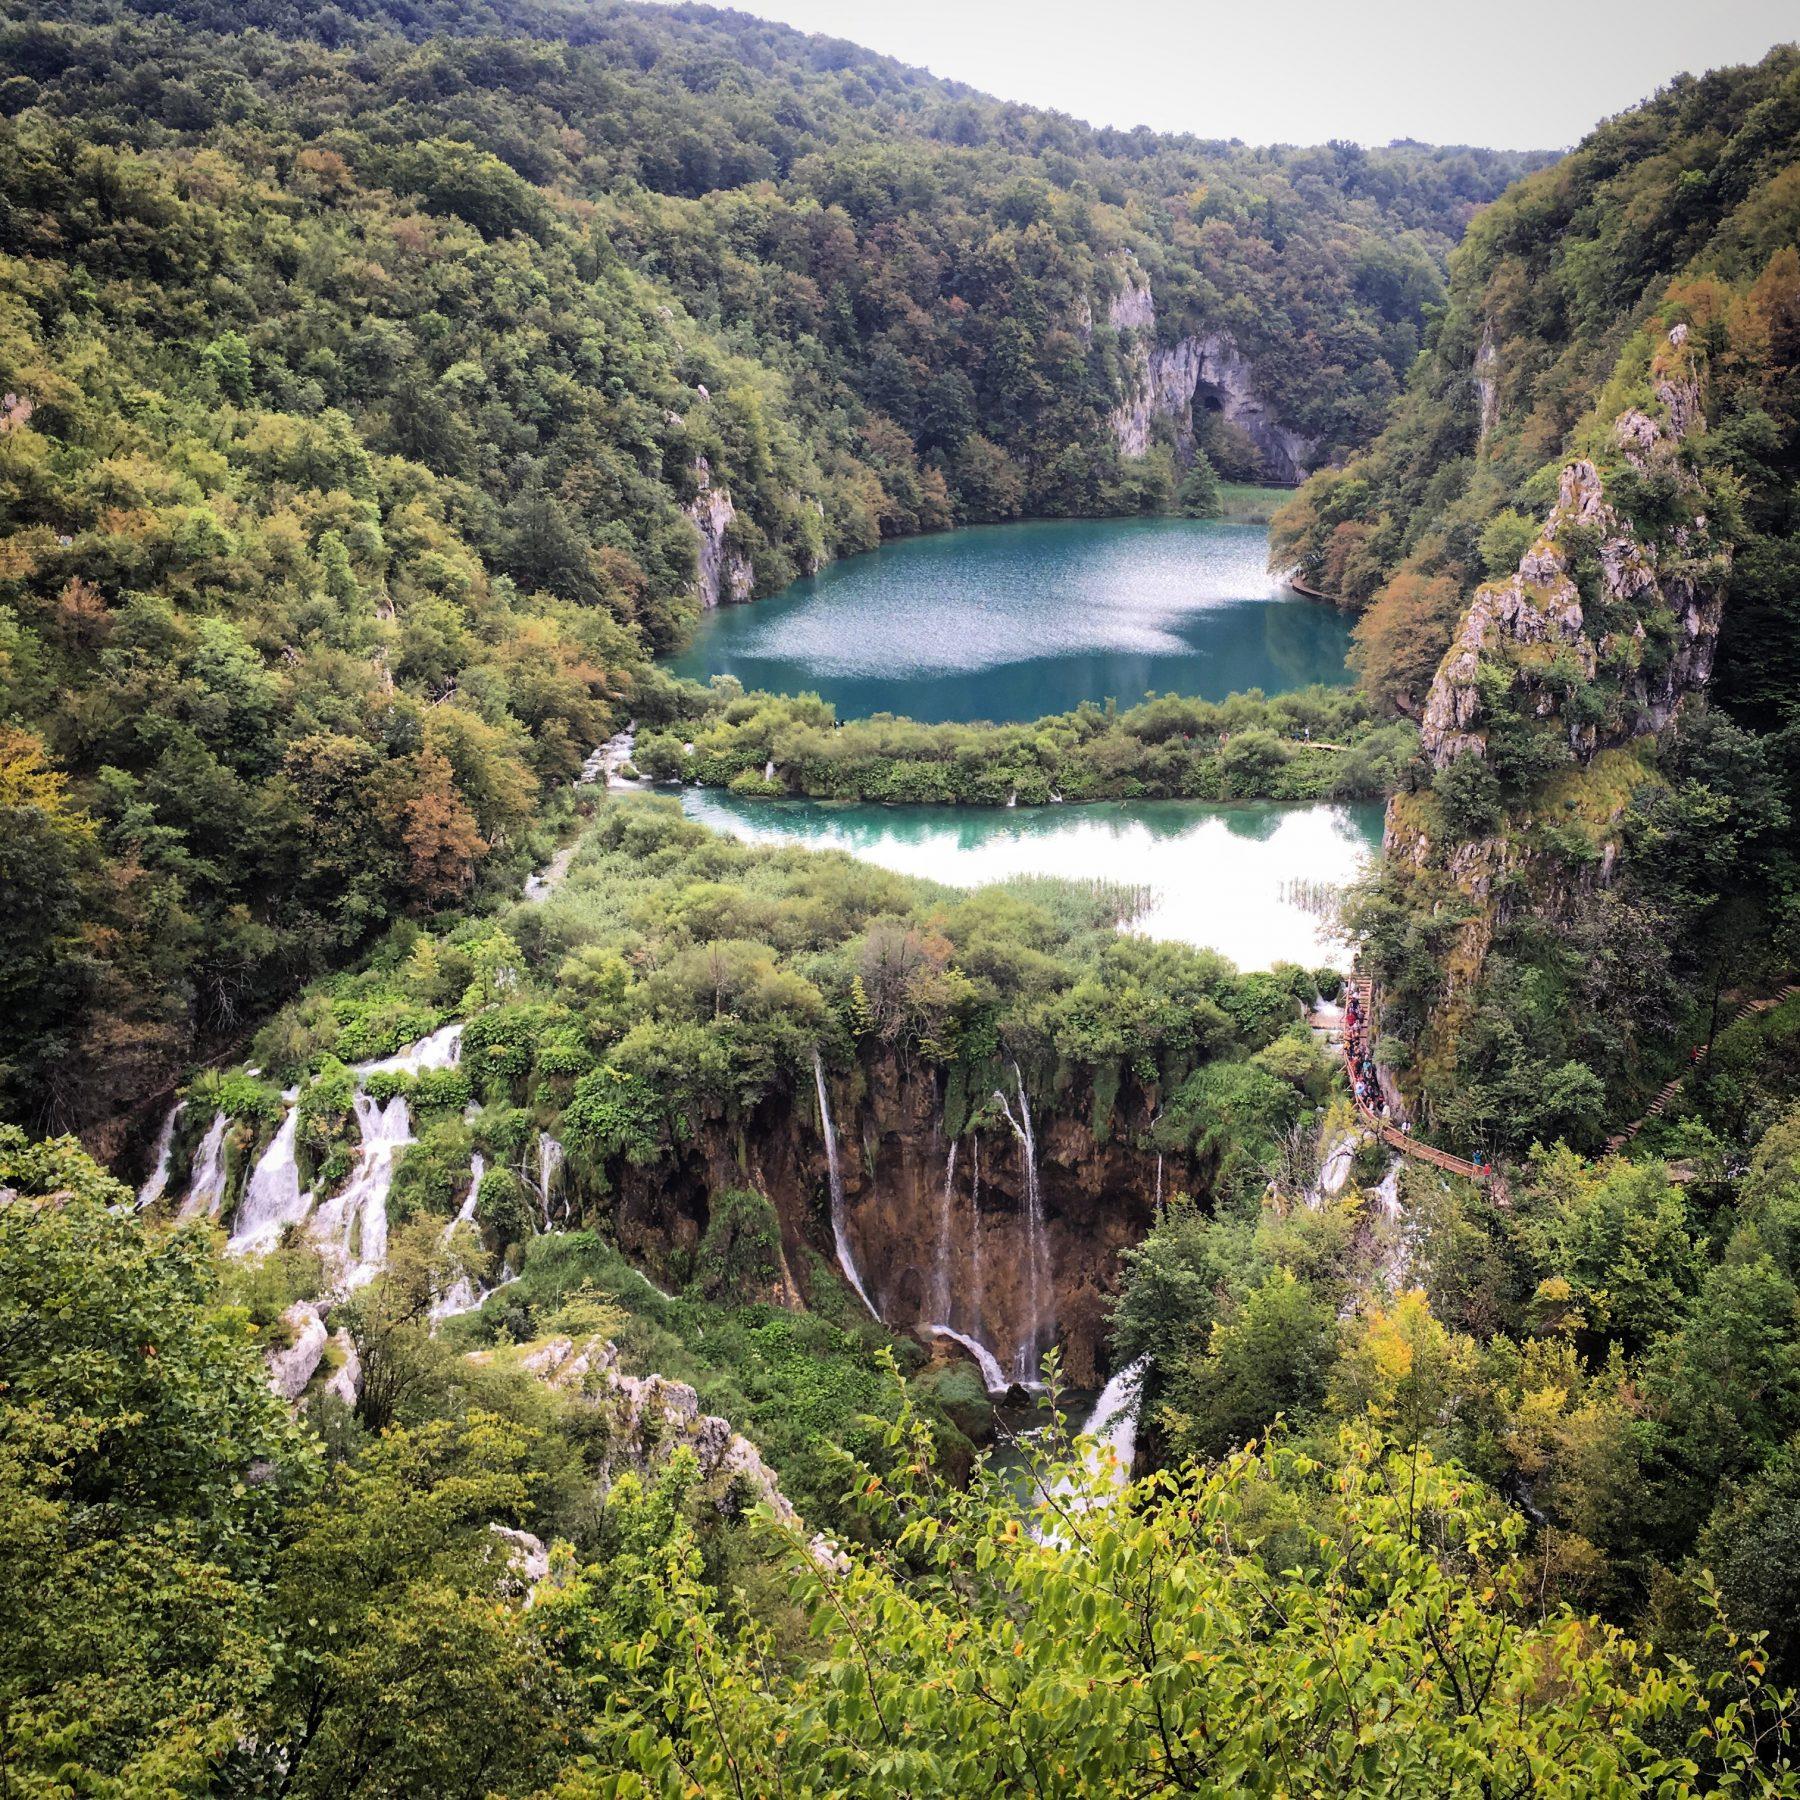 Europe Archives Exploring Kiwis